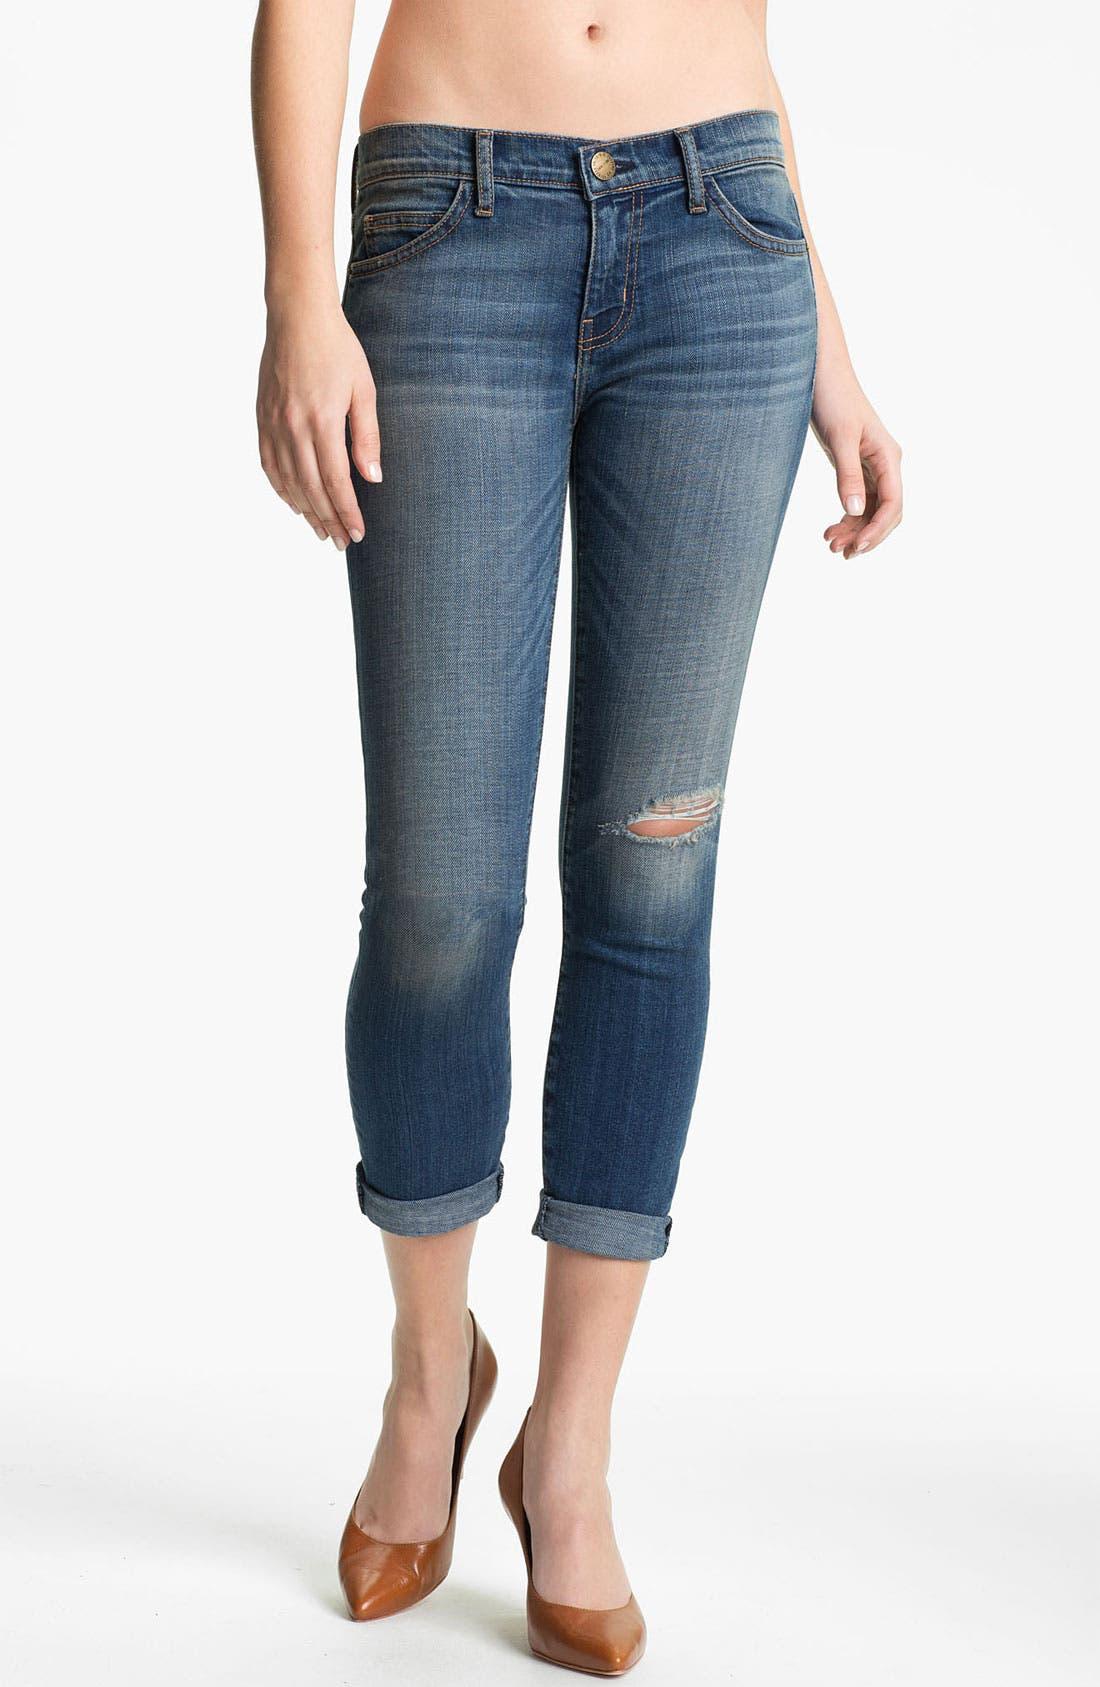 Alternate Image 1 Selected - Current/Elliott 'The Stiletto' Skinny Stretch Jeans (Juke Box/Destroy)